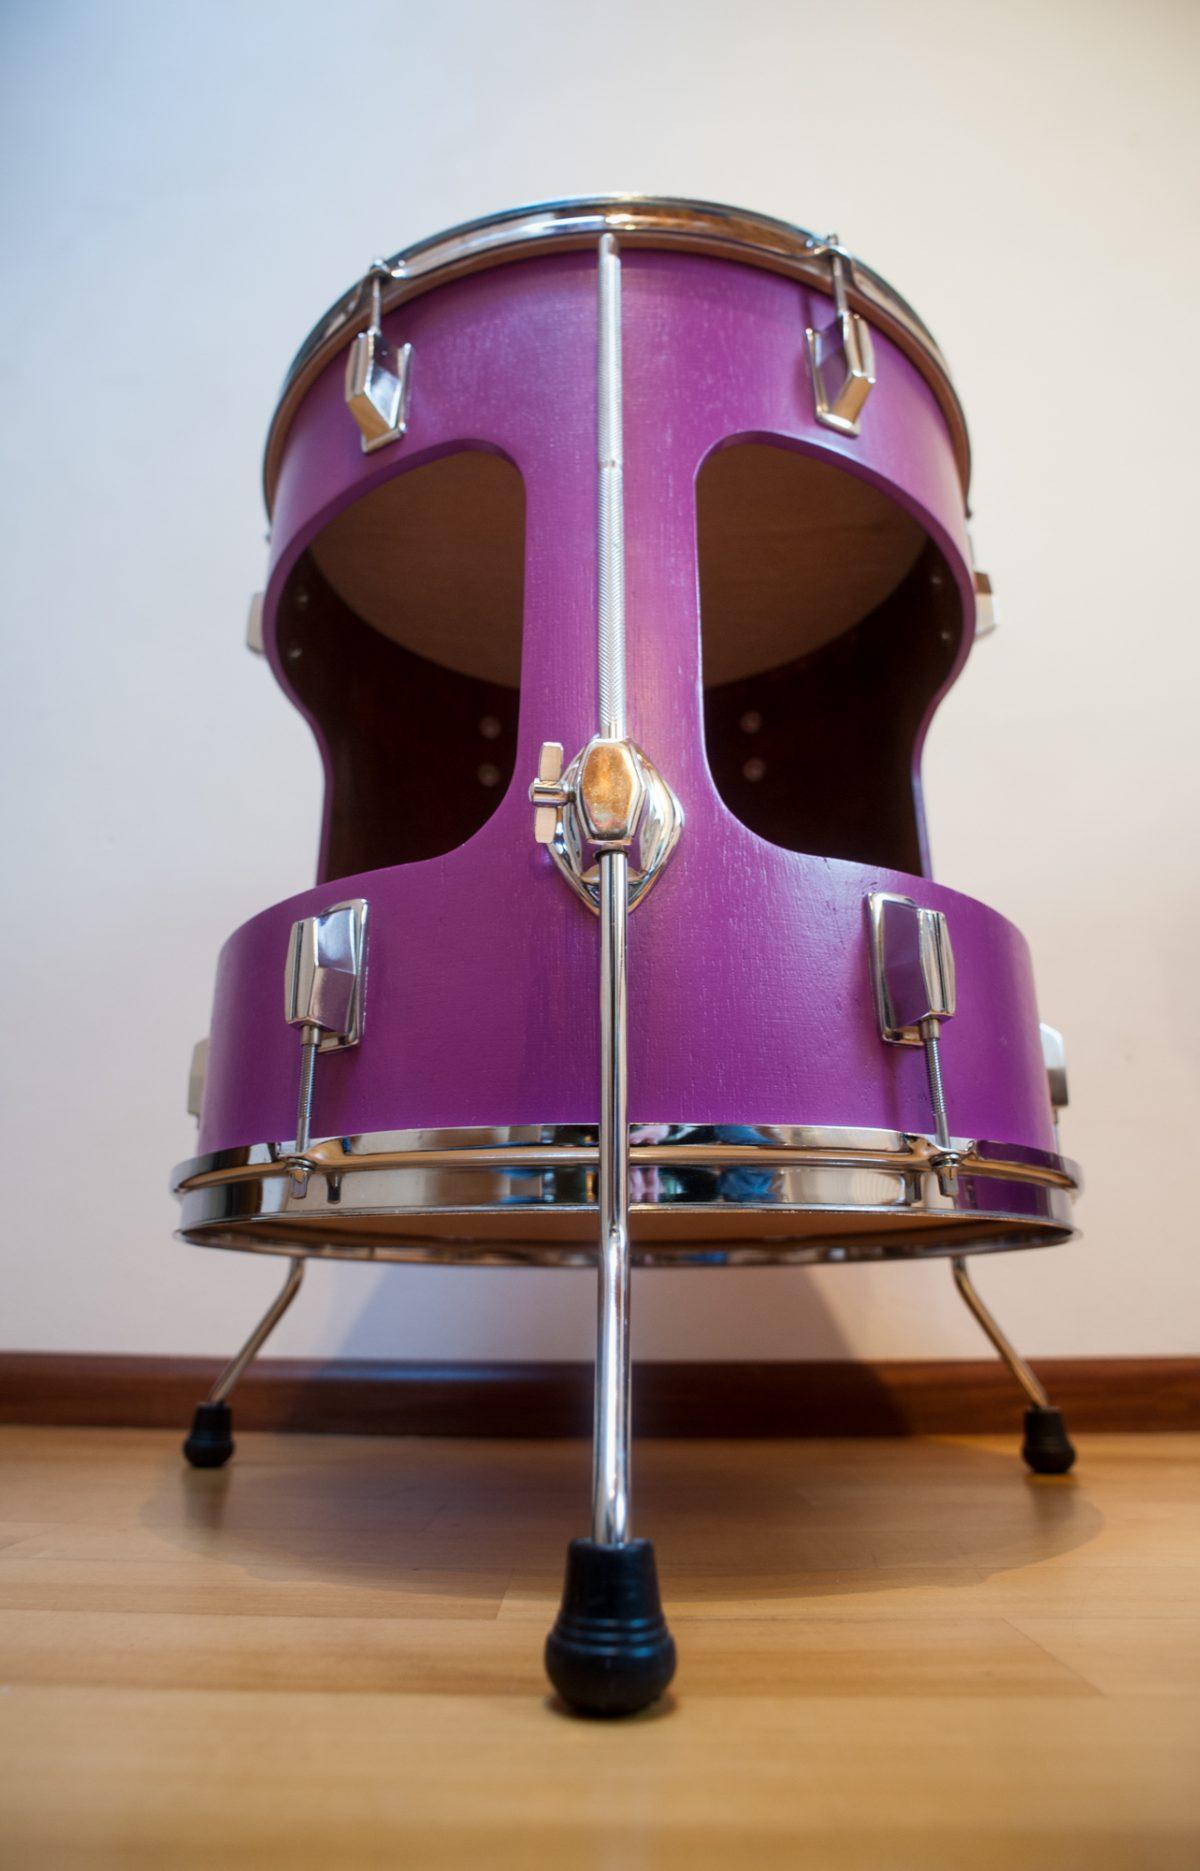 floortom tafel - paars - closeup